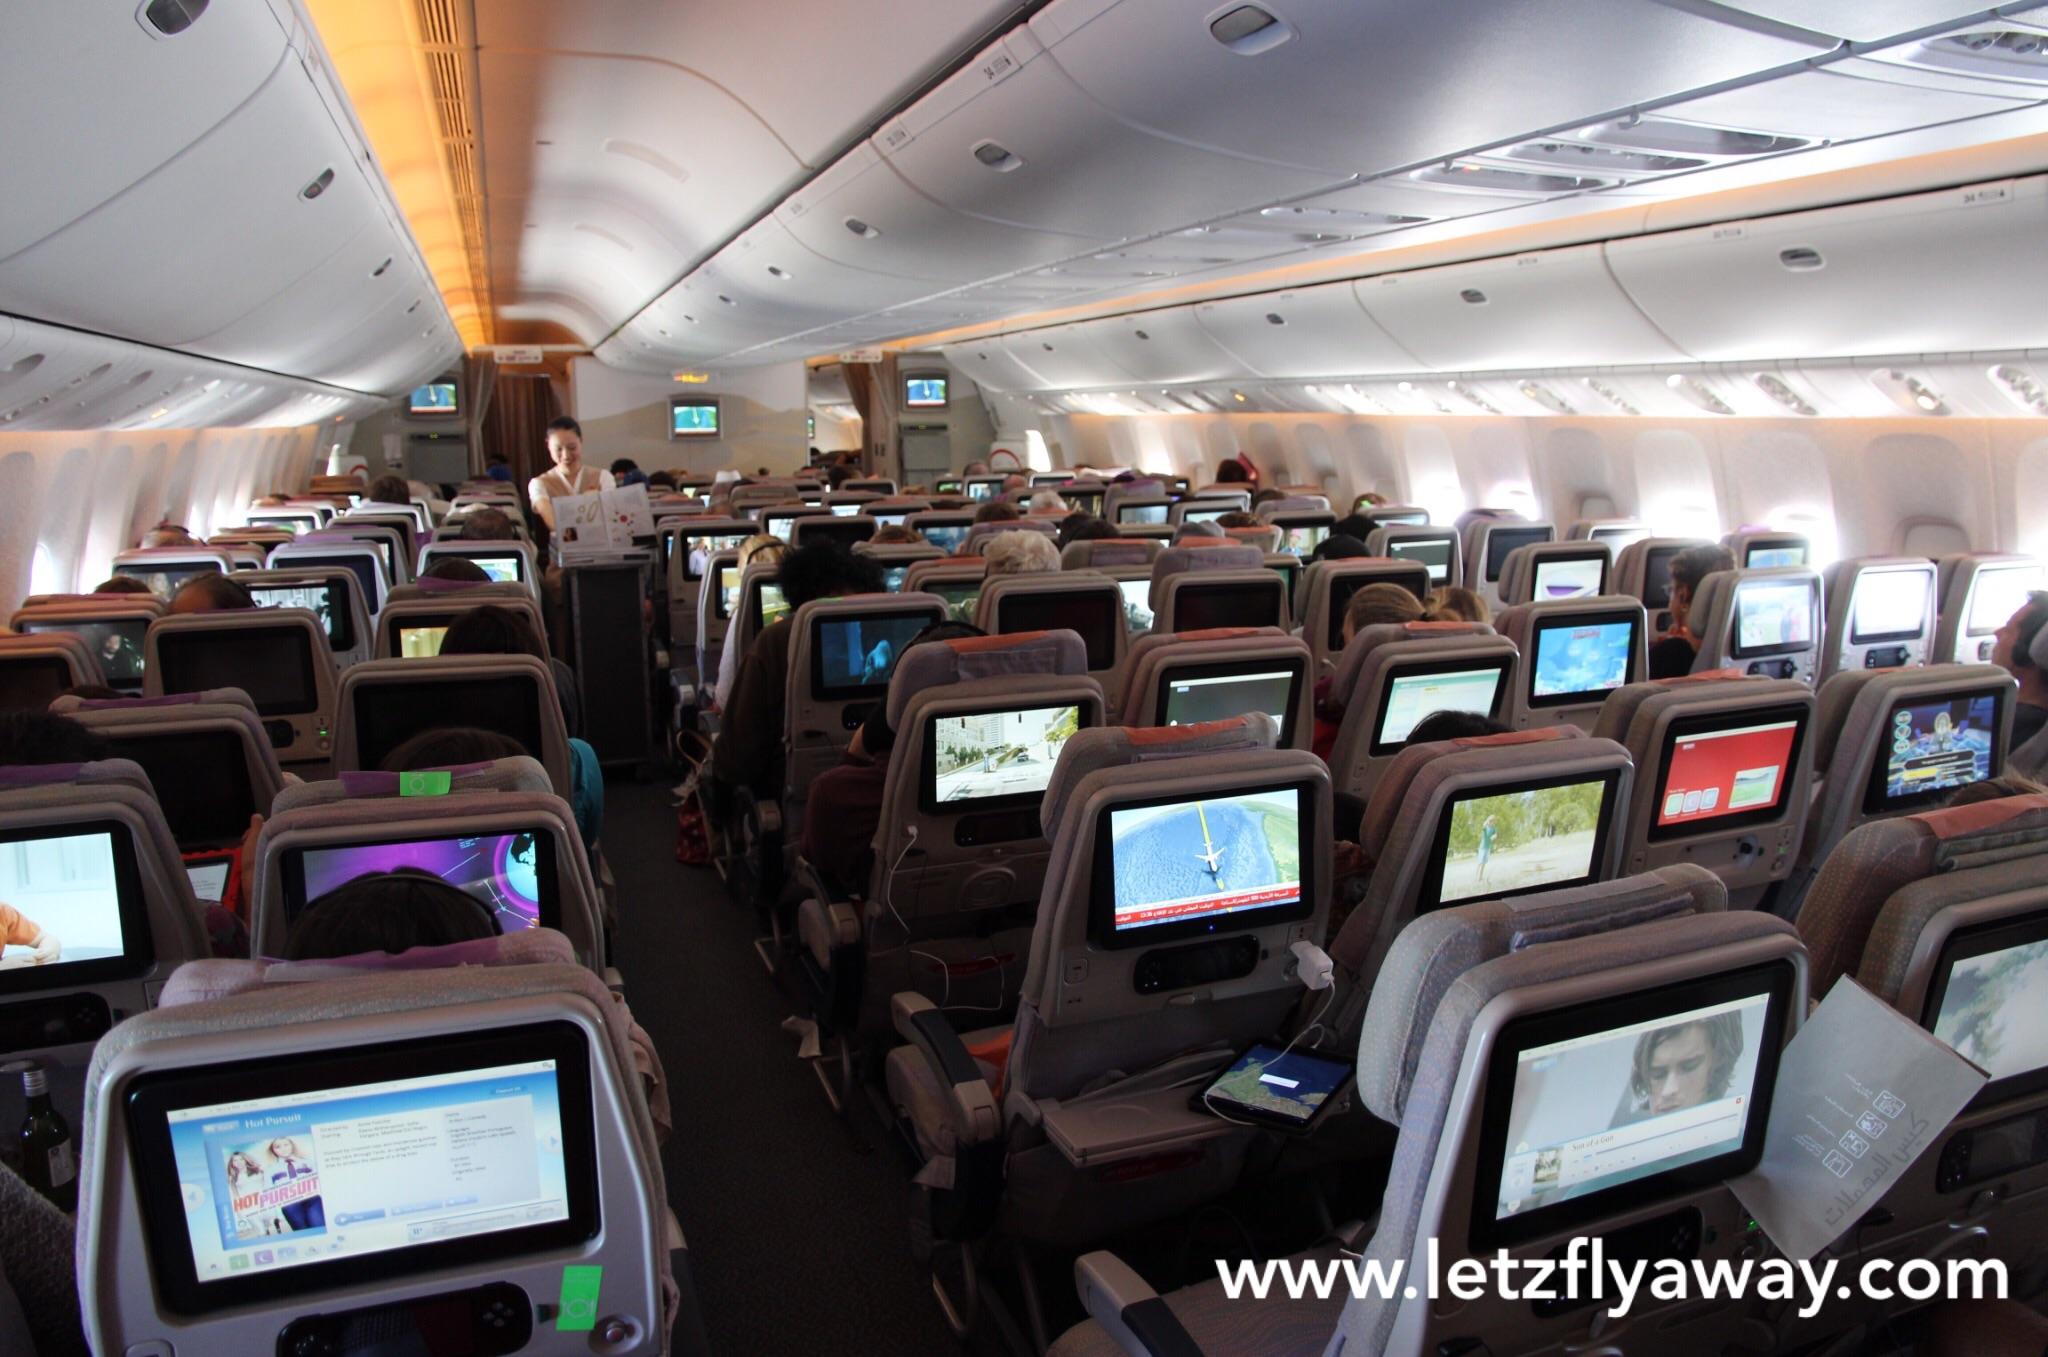 Boeing 777 Interior Economy | www.imgkid.com - The Image ...